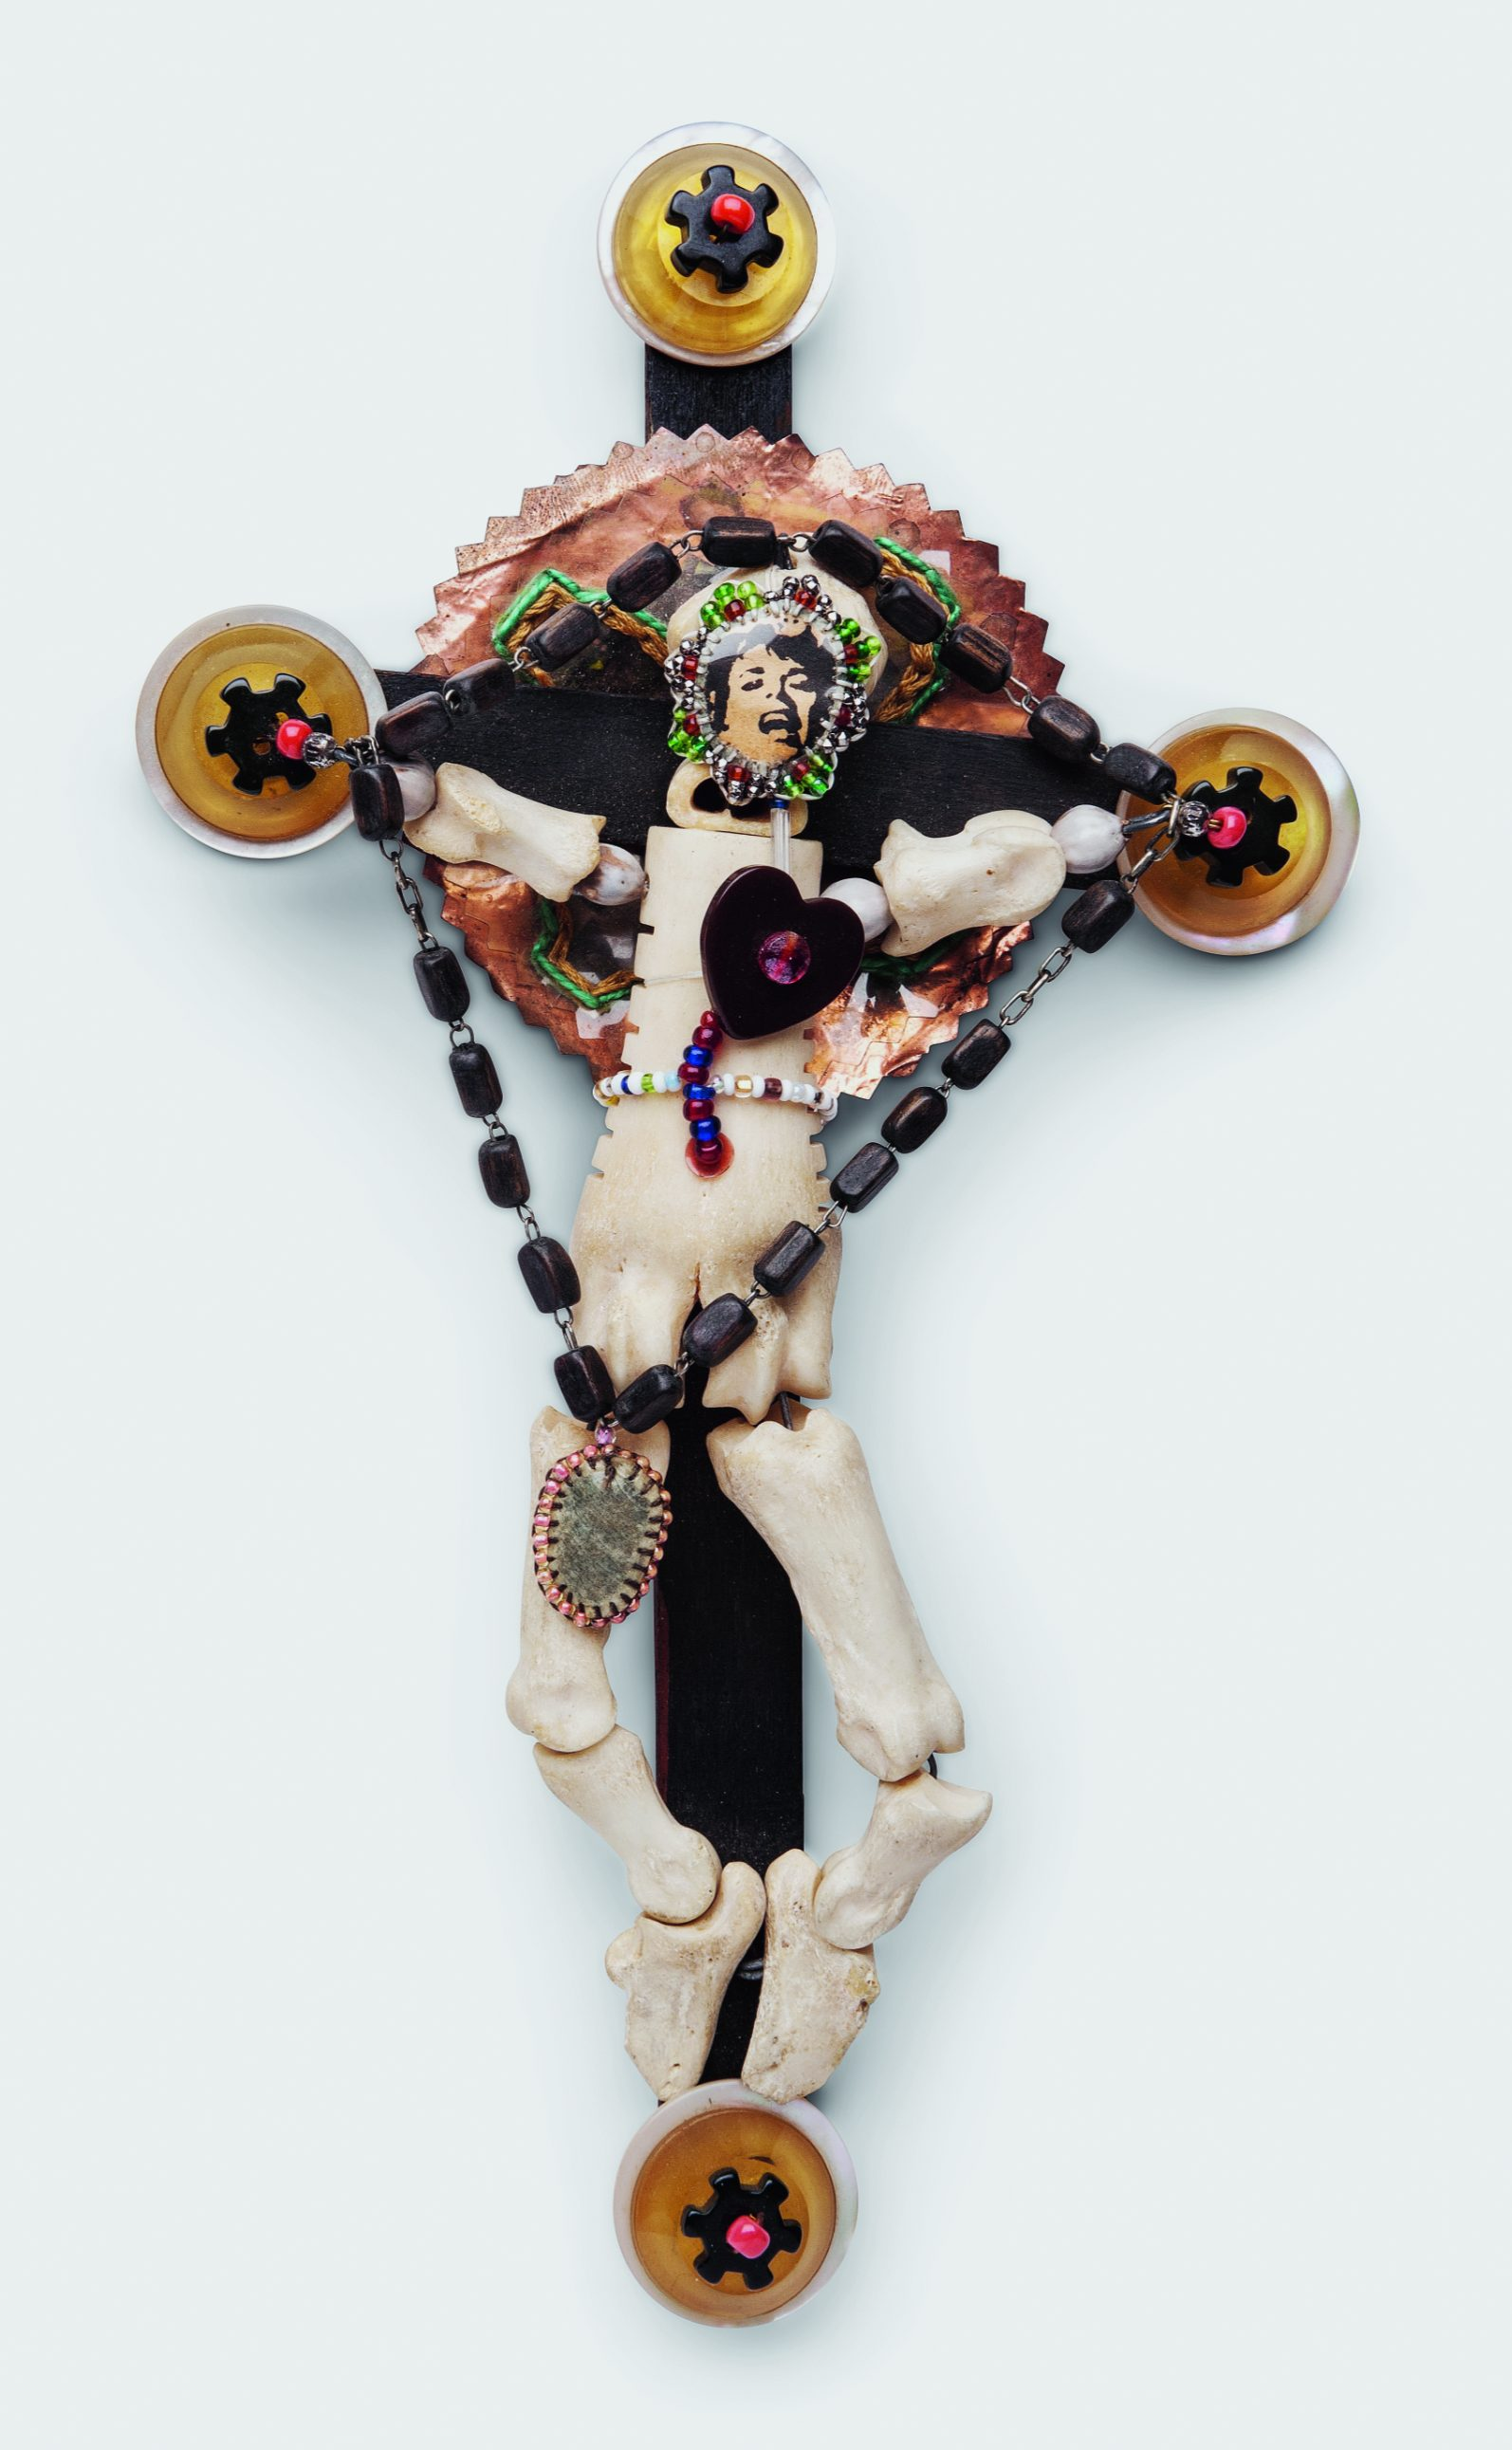 Joyce J. Scott, The Double Cross, from the Jonestown Massacre series, 1980. Collectie Philbrook Museum of Art, 1991.21.3